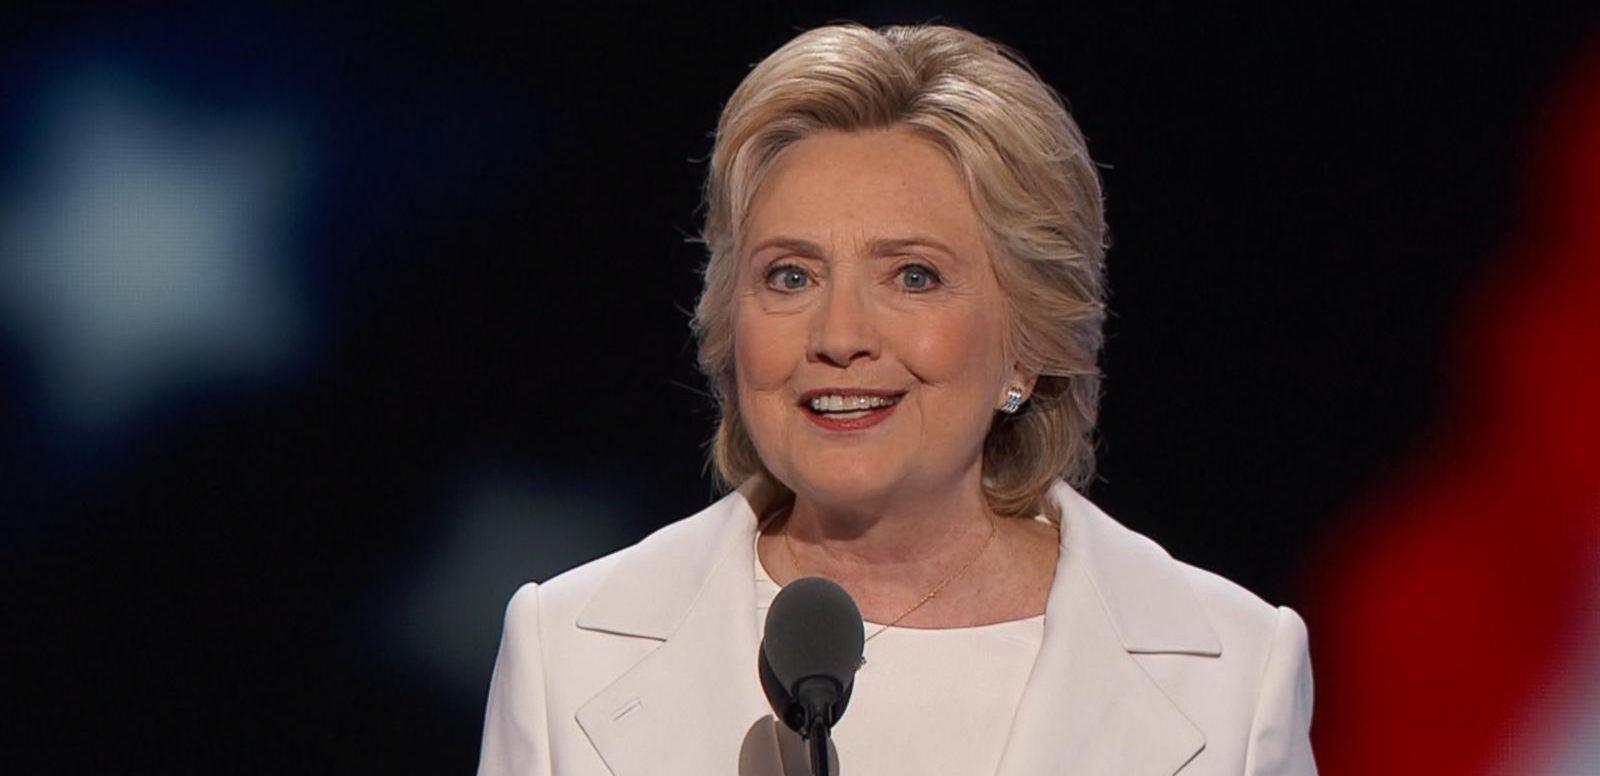 Hillary Clinton Accepts the Democratic Nomination